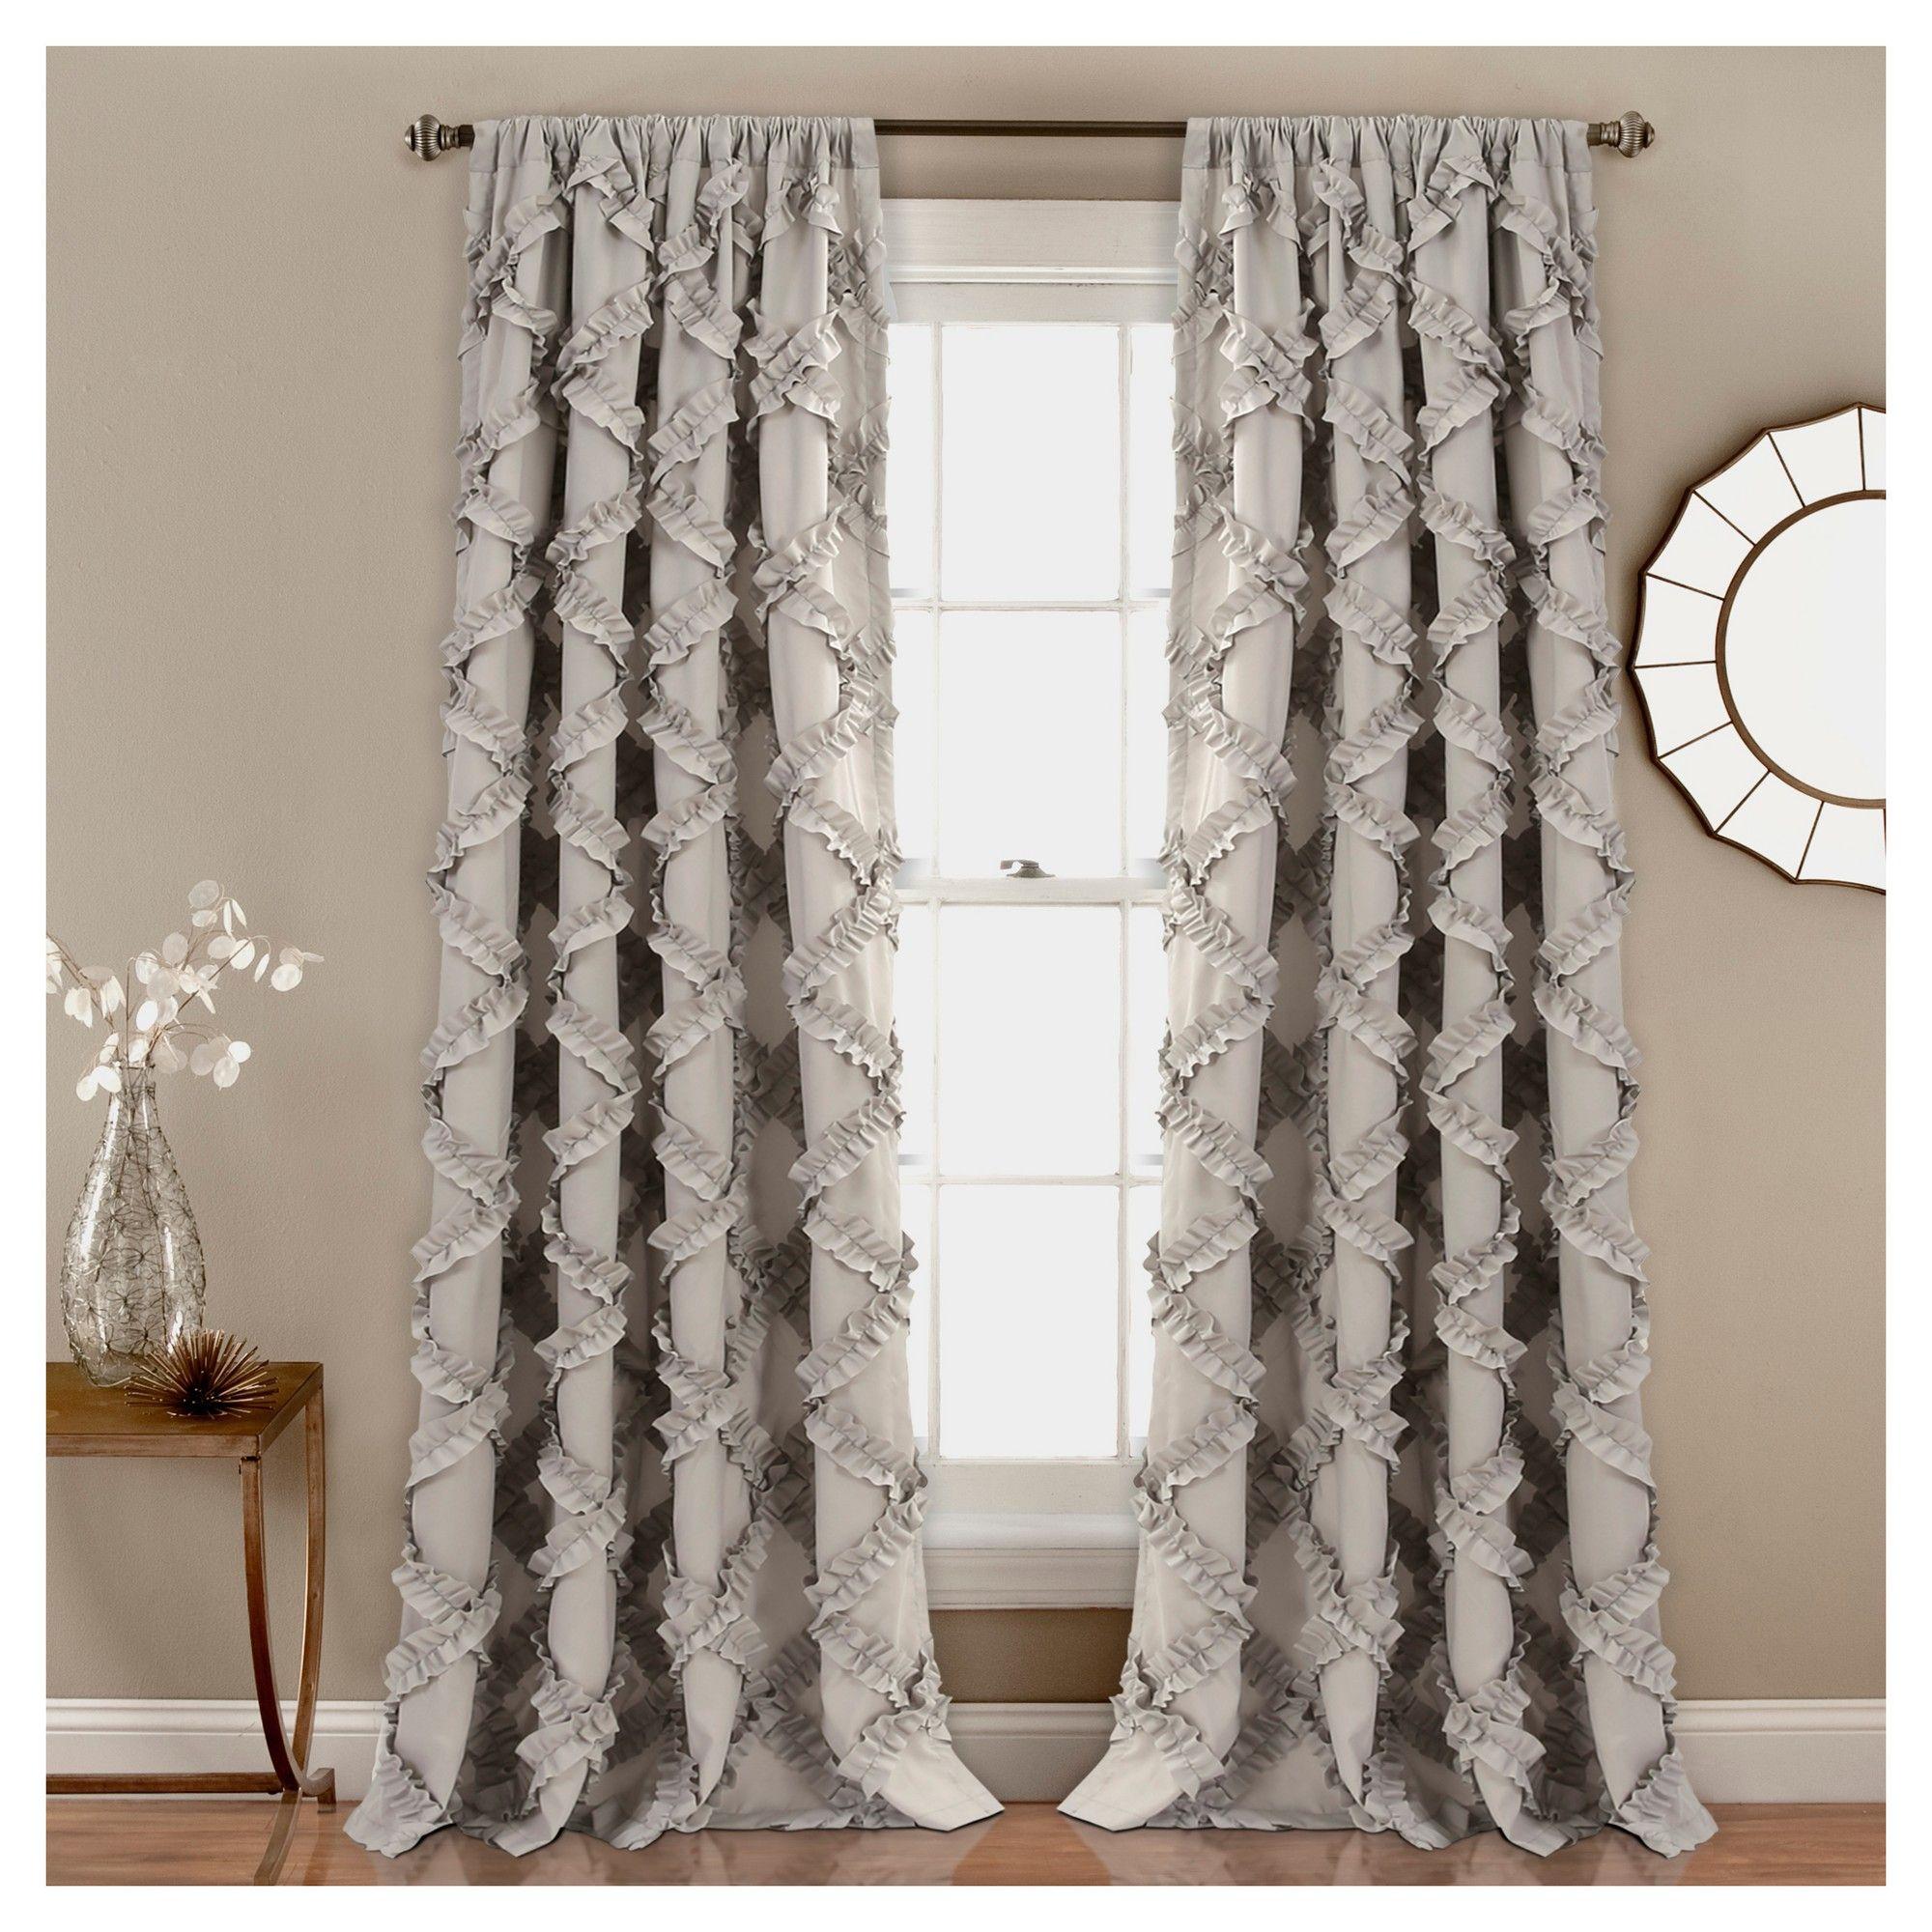 Set Of 2 84 X54 Ruffle Diamond Light Filtering Window Curtain Panels Gray Lush Decor Lush Decor Easy Home Decor Panel Curtains